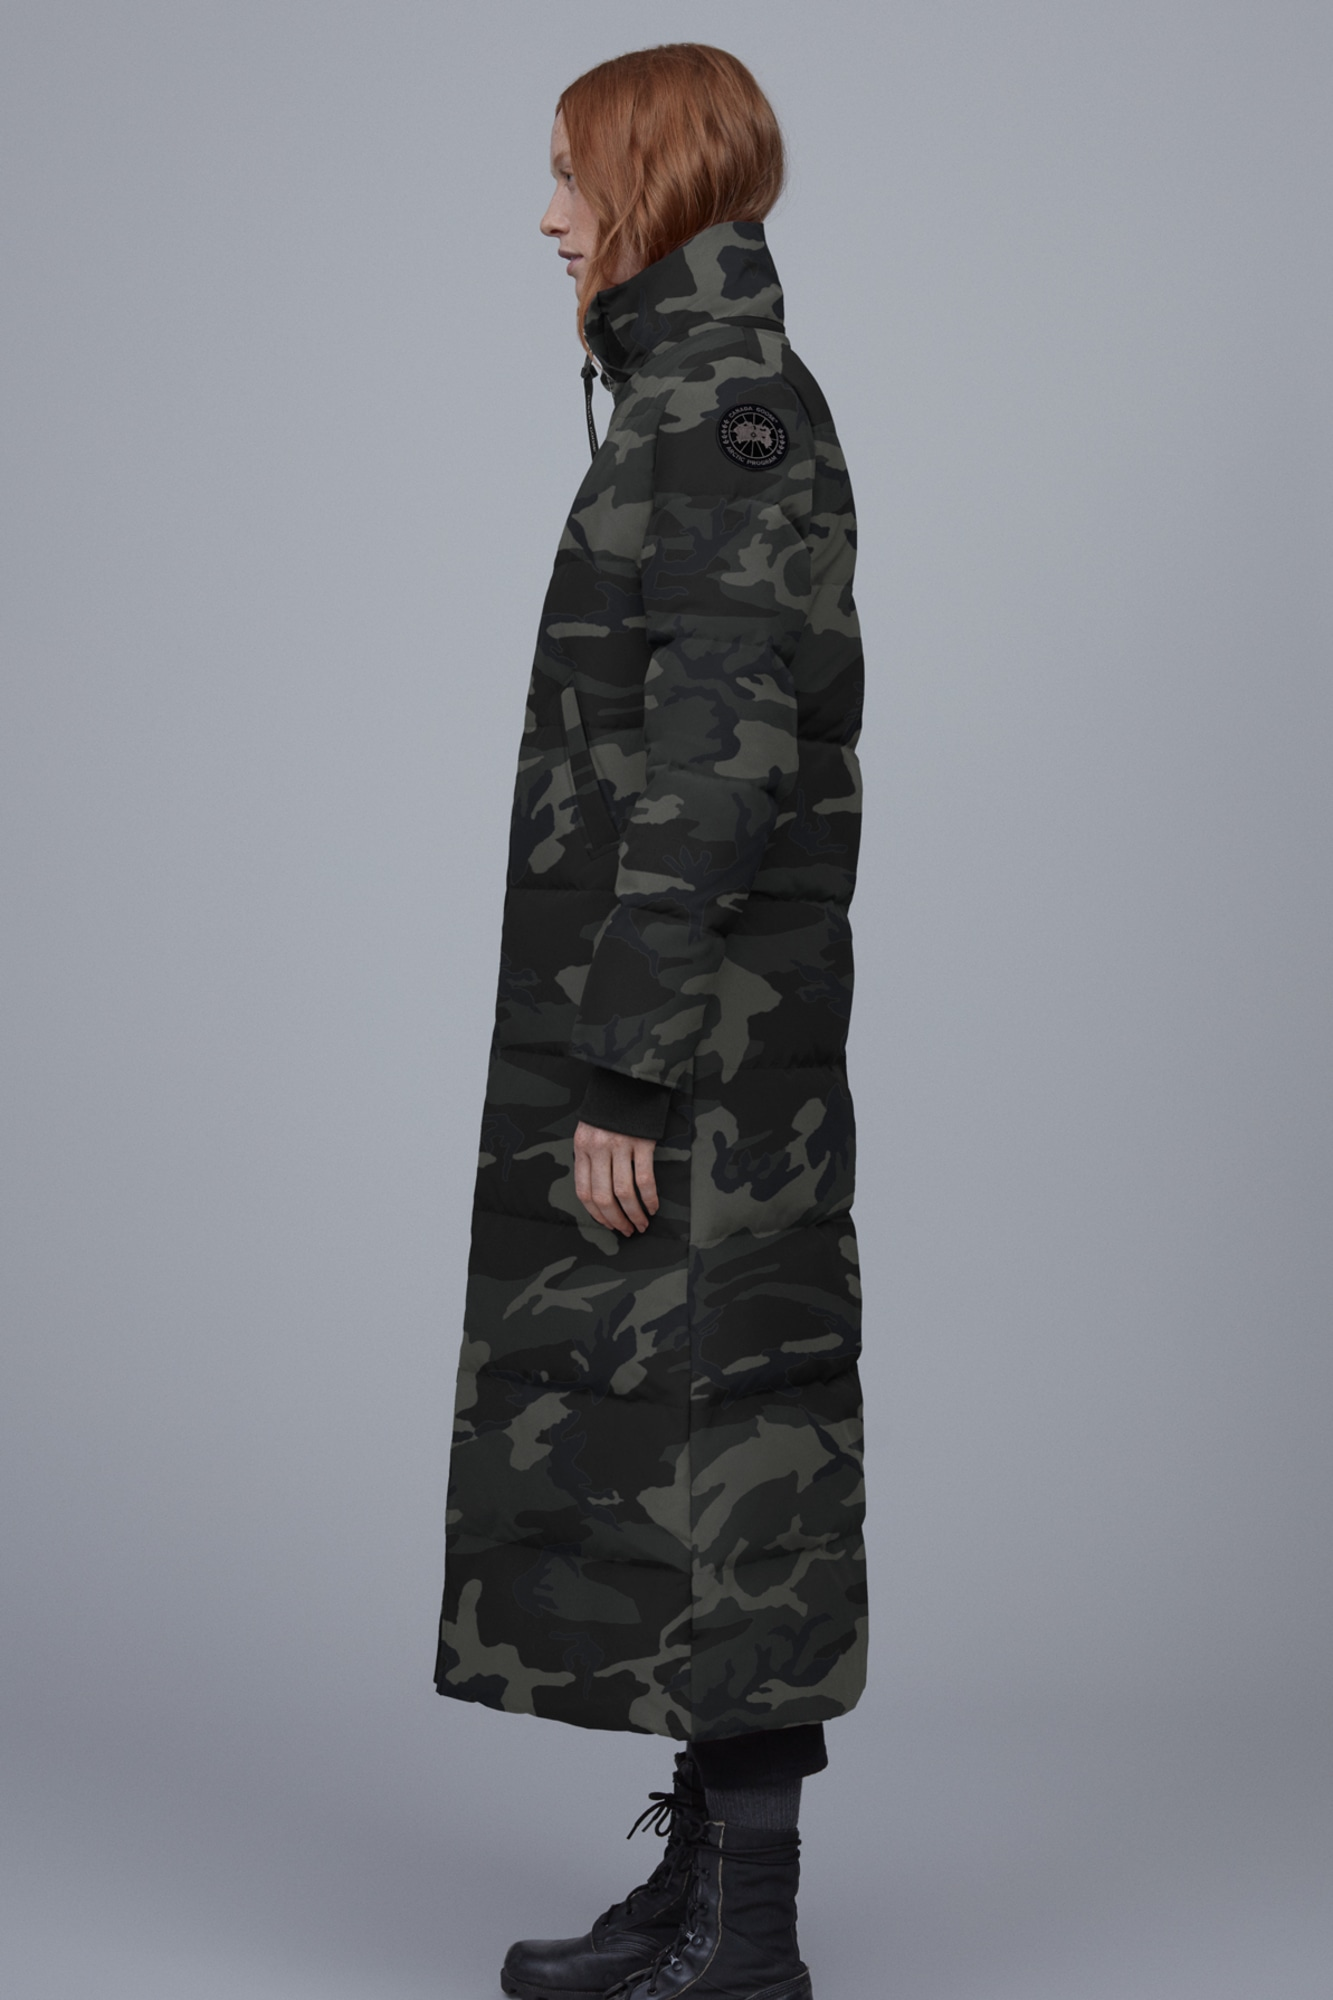 3e5ee5c3891c5 Women's Mystique Parka Black Label | Canada Goose®